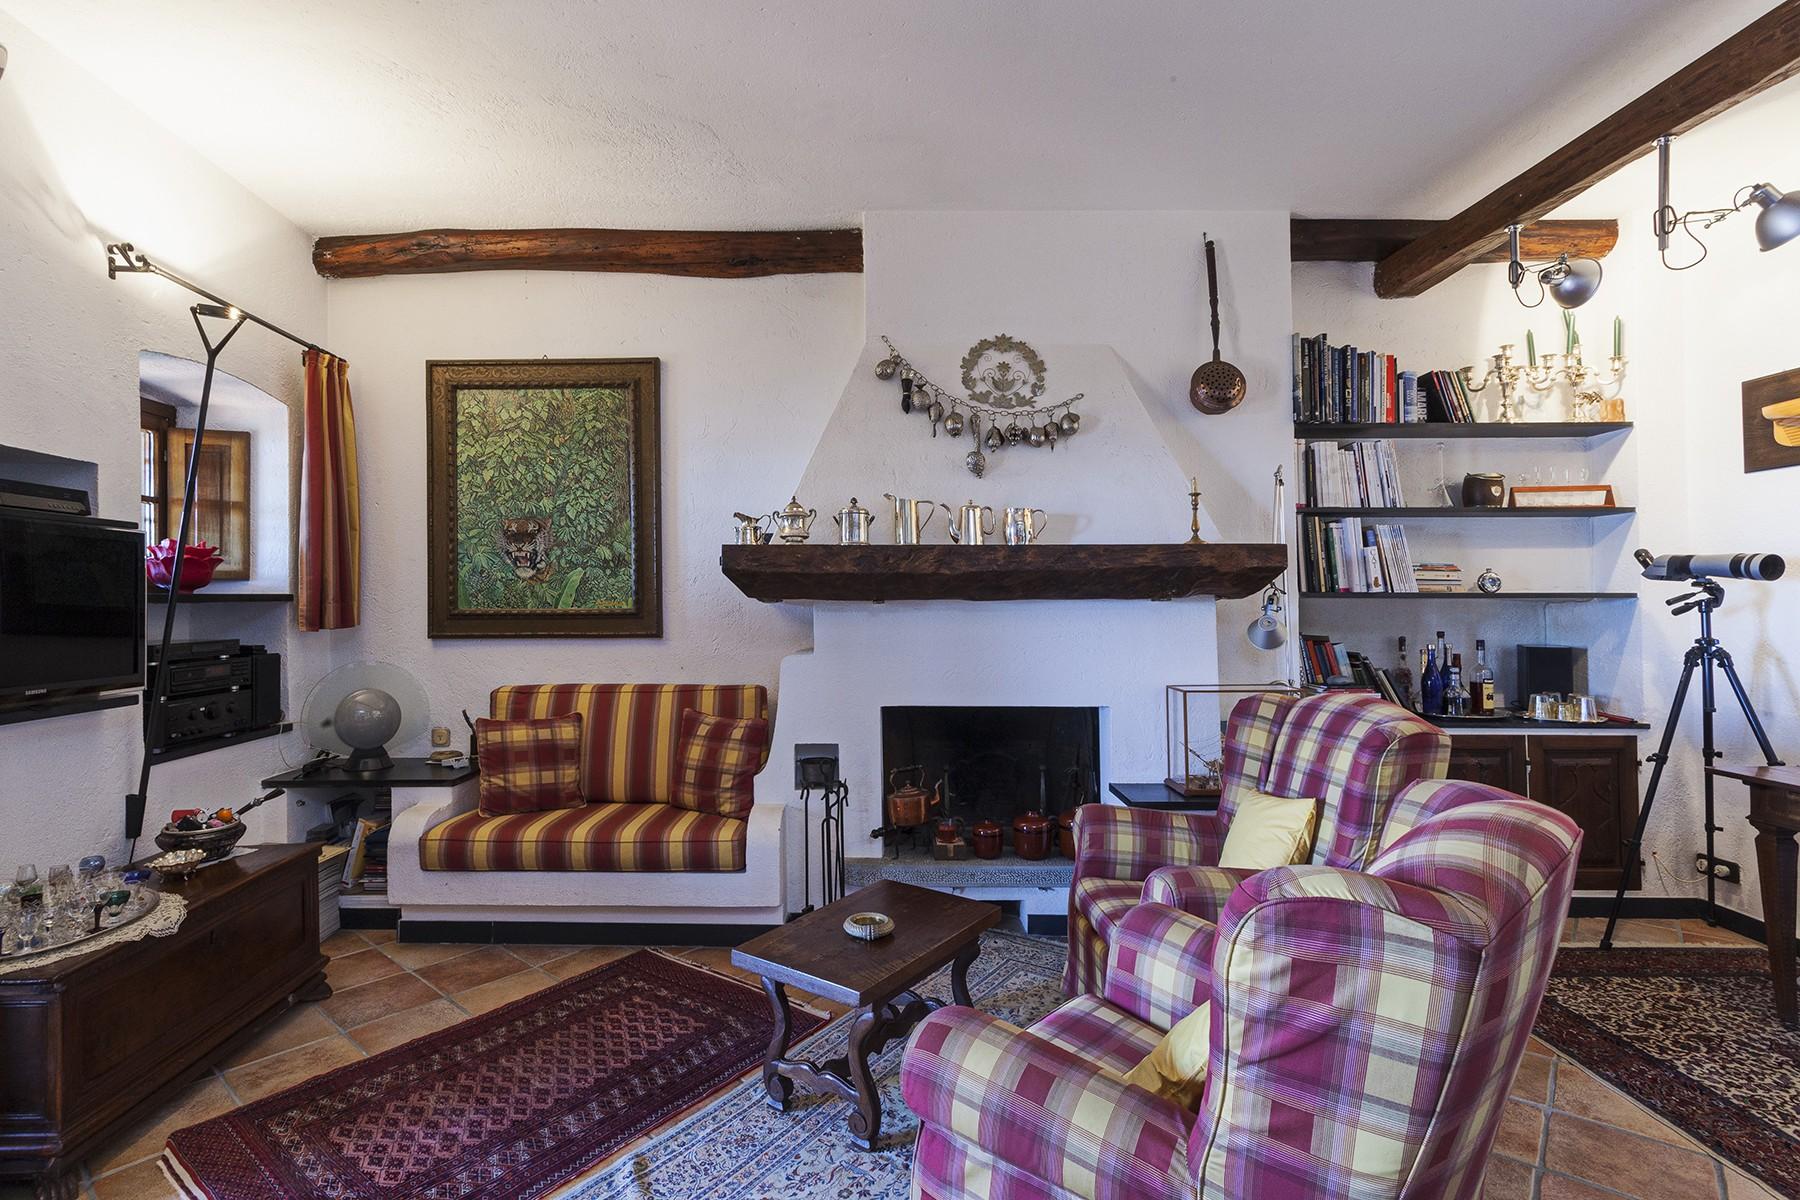 Villa in Vendita a Santa Margherita Ligure: 5 locali, 180 mq - Foto 7